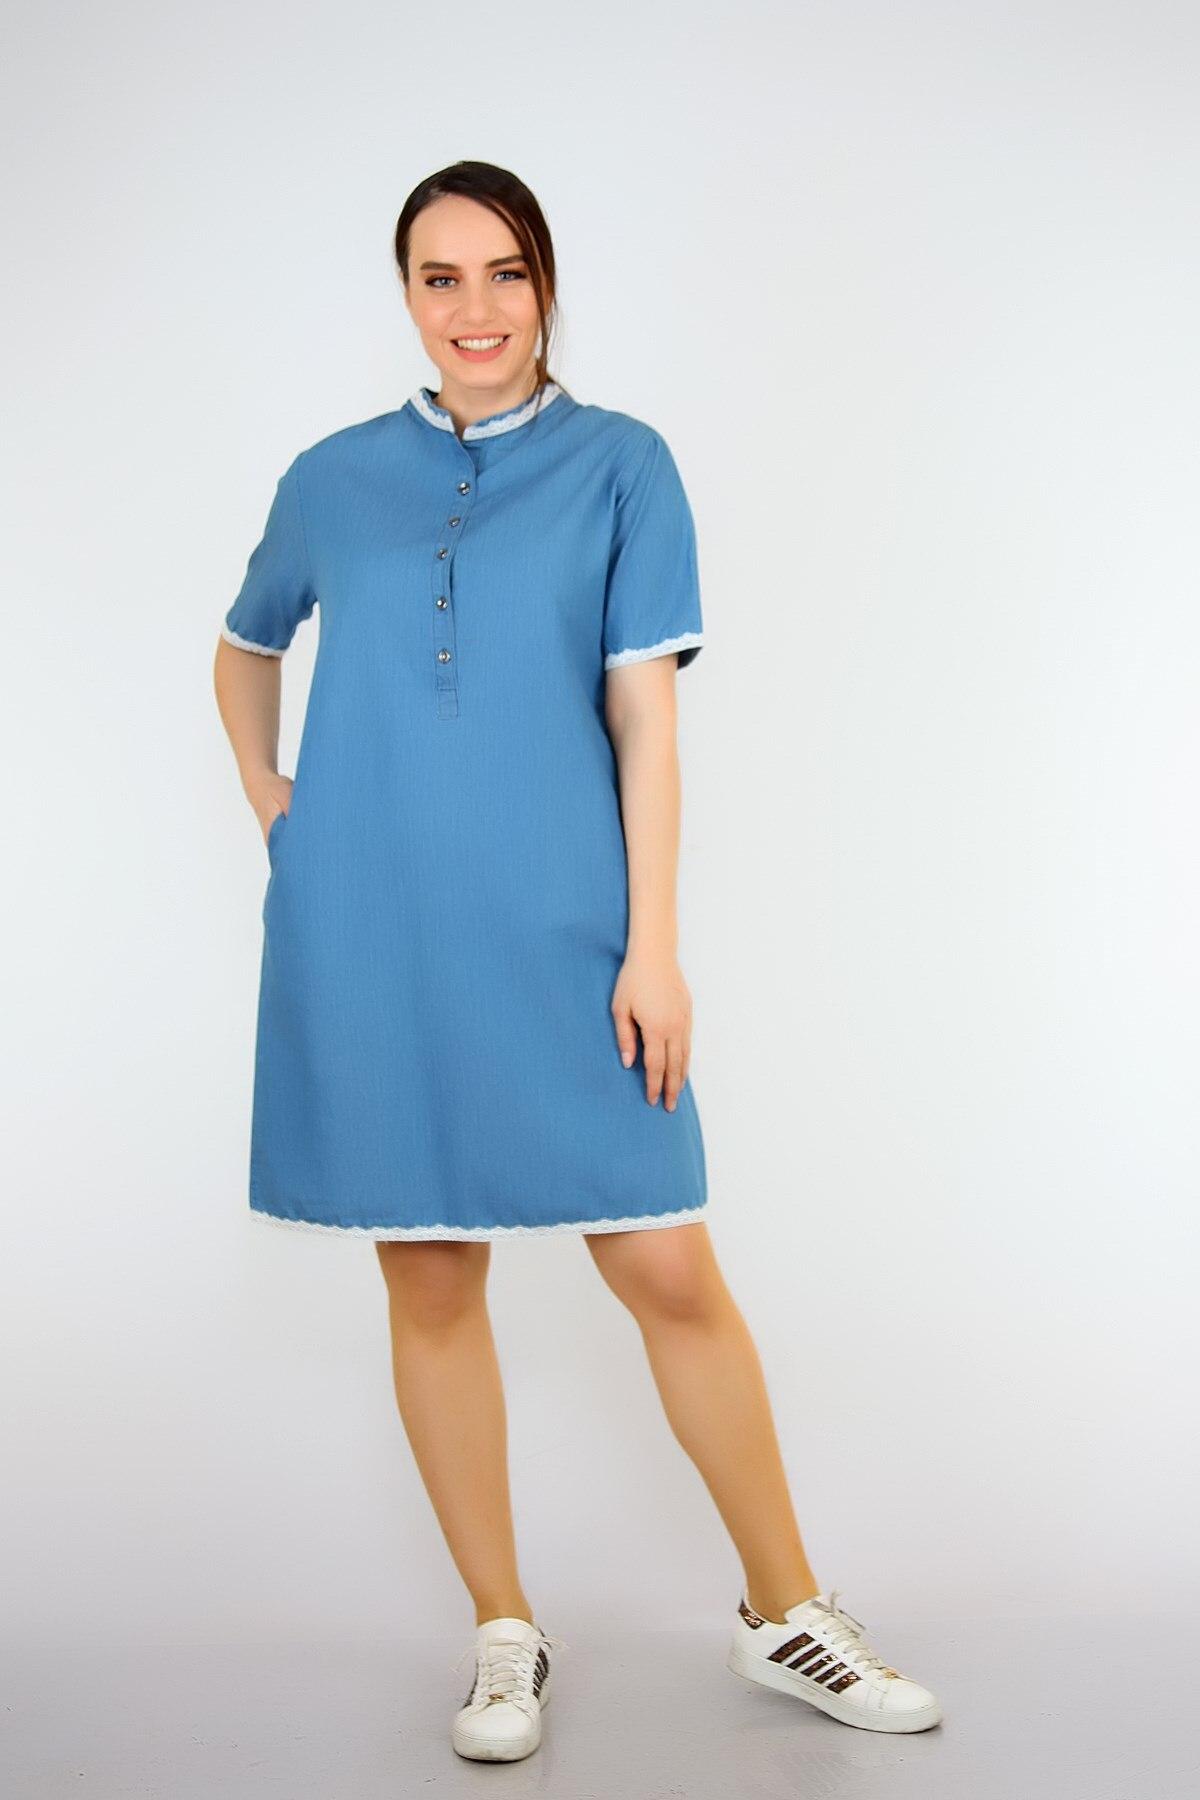 Pianoluce Women 'S Denim Lace Detail Half Sleeve Dress Blue 1387 1